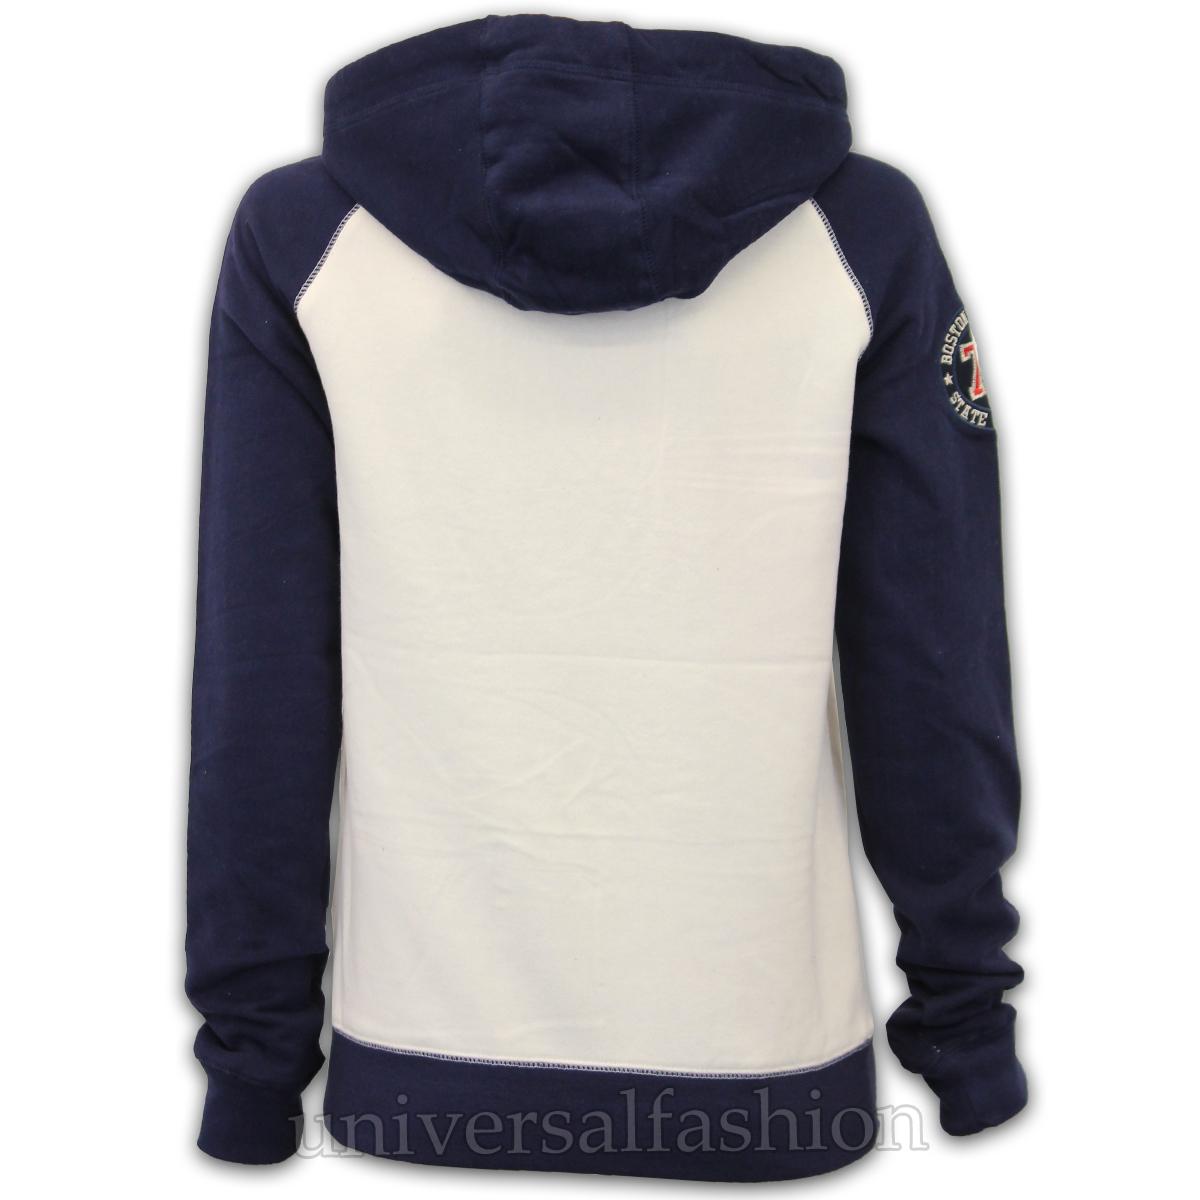 Ladies-Sweatshirt-Womens-Brave-Soul-Hooded-Fleece-Lined-Pullover-Top-Casual-New miniatura 4